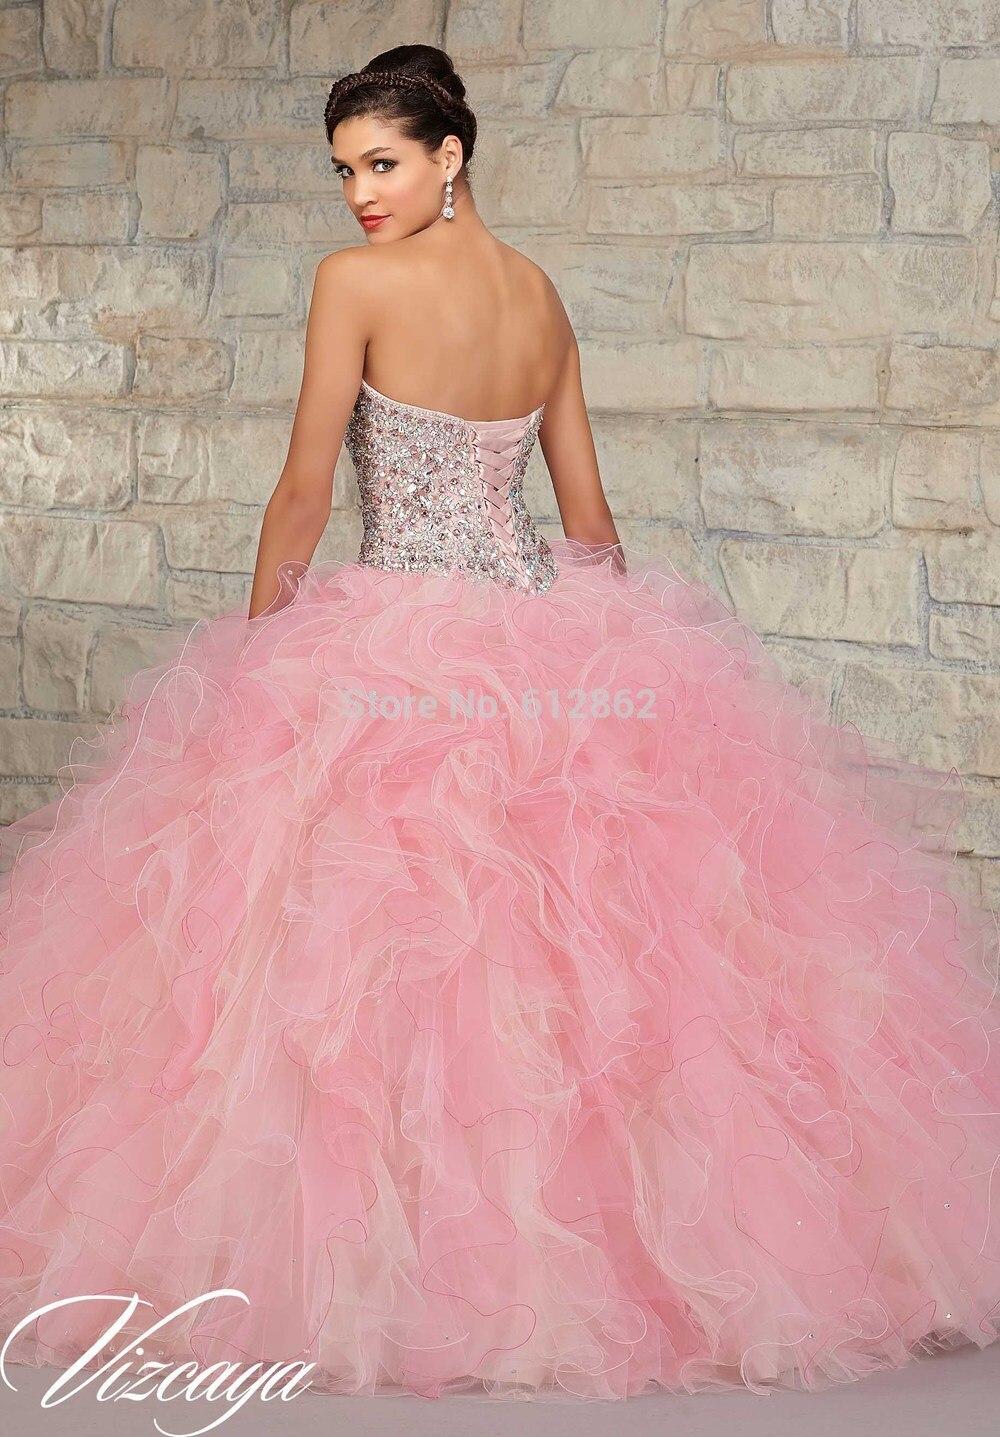 Elegant Ball Gown Ruffled Organza Skirt Beaded Crystals Top Light ...